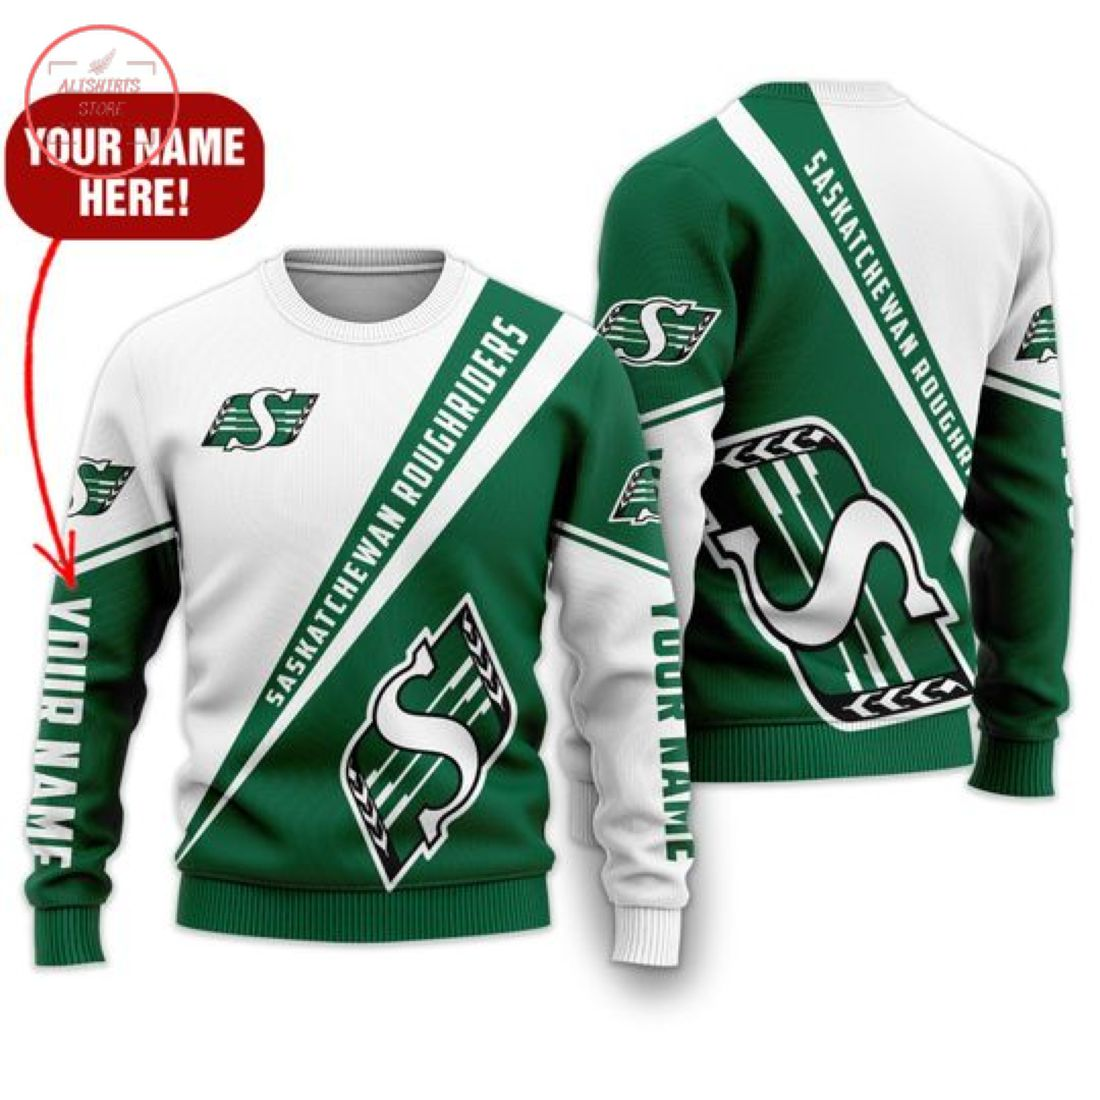 Personalized Cfl Saskatchewan Roughriders Shirts